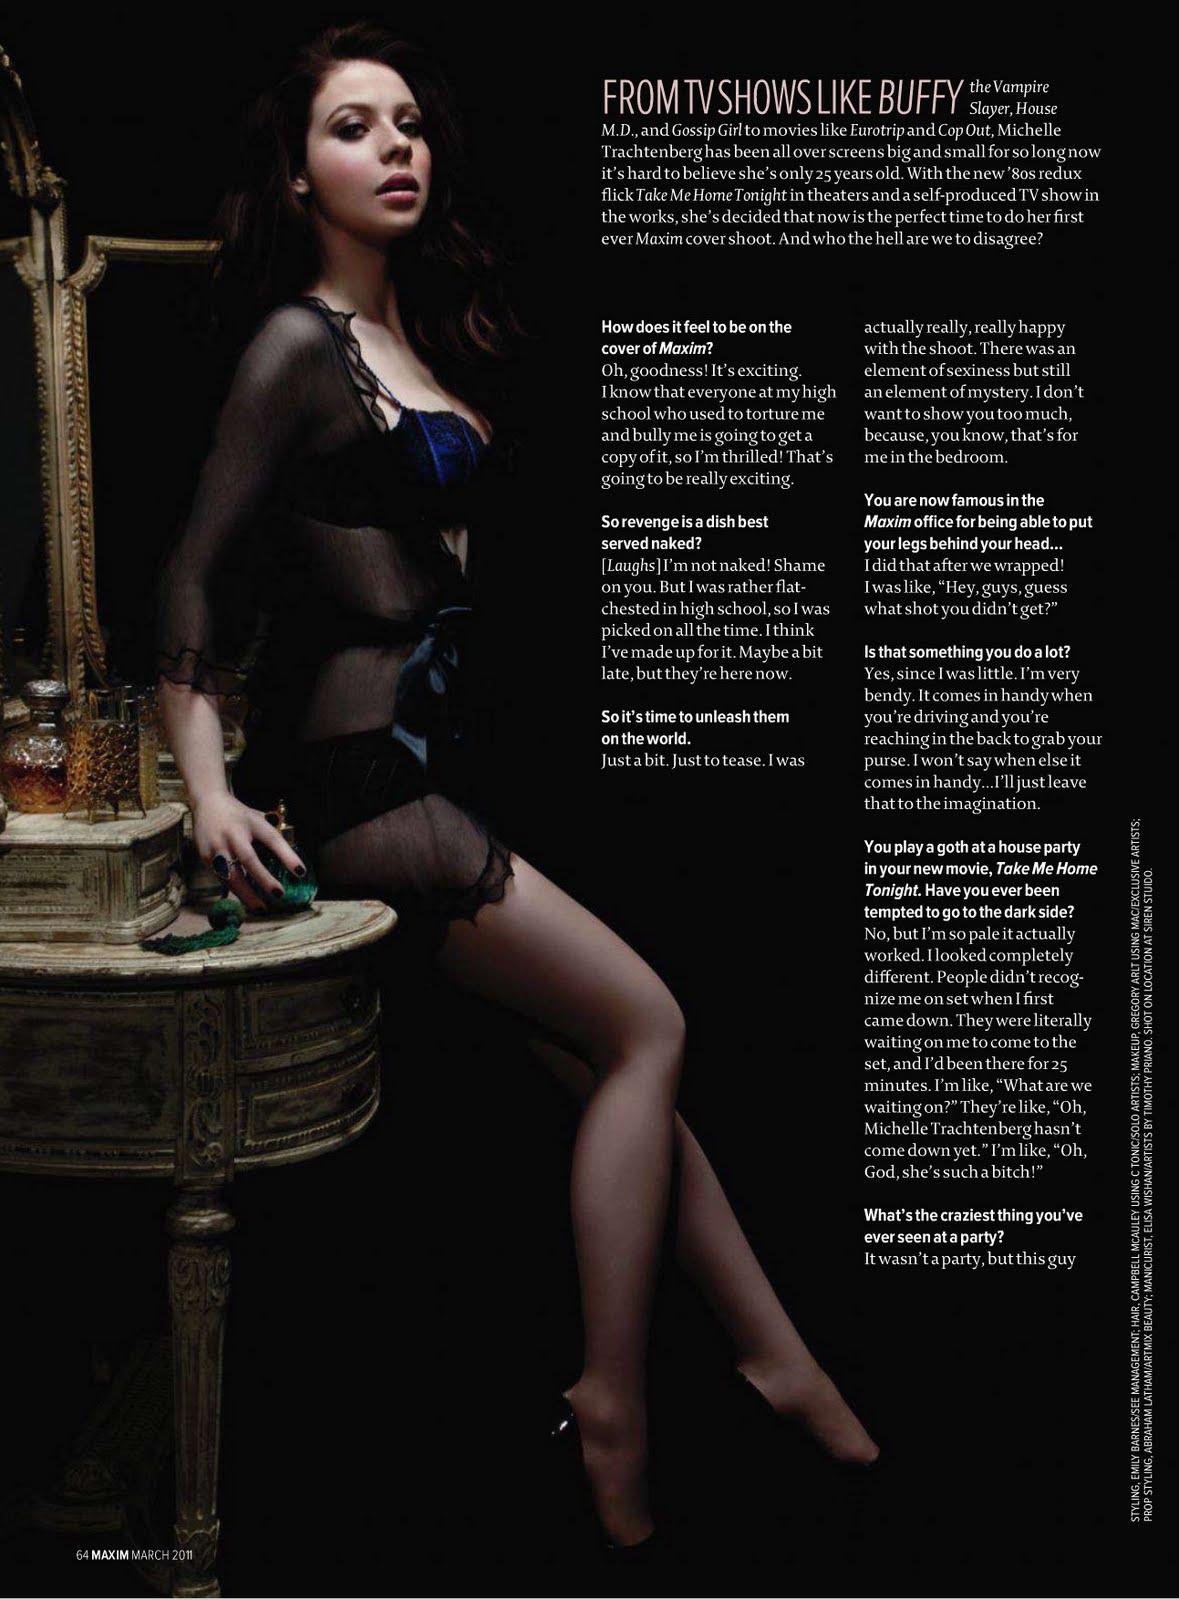 http://2.bp.blogspot.com/-2Oy5hjC5tB4/Tb004gHu6XI/AAAAAAAACqQ/eTcTYpUrX10/s1600/Michelle+Trachtenberg+-+Maxim+Magazine+March+2011.jpg